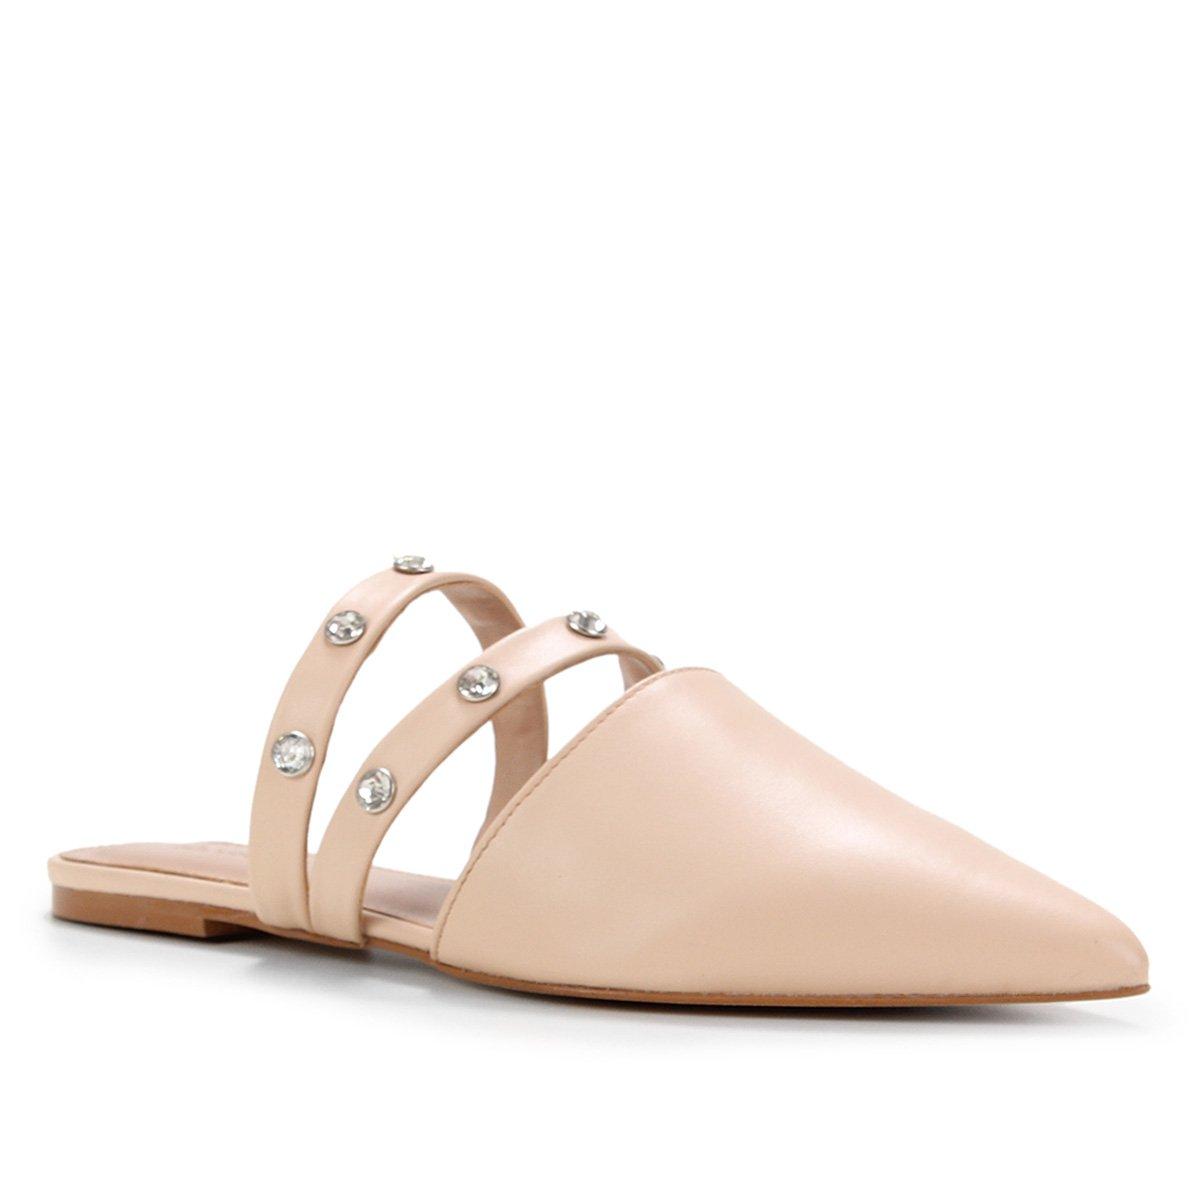 Mule Couro Shoestock Flat Bico Fino Strass